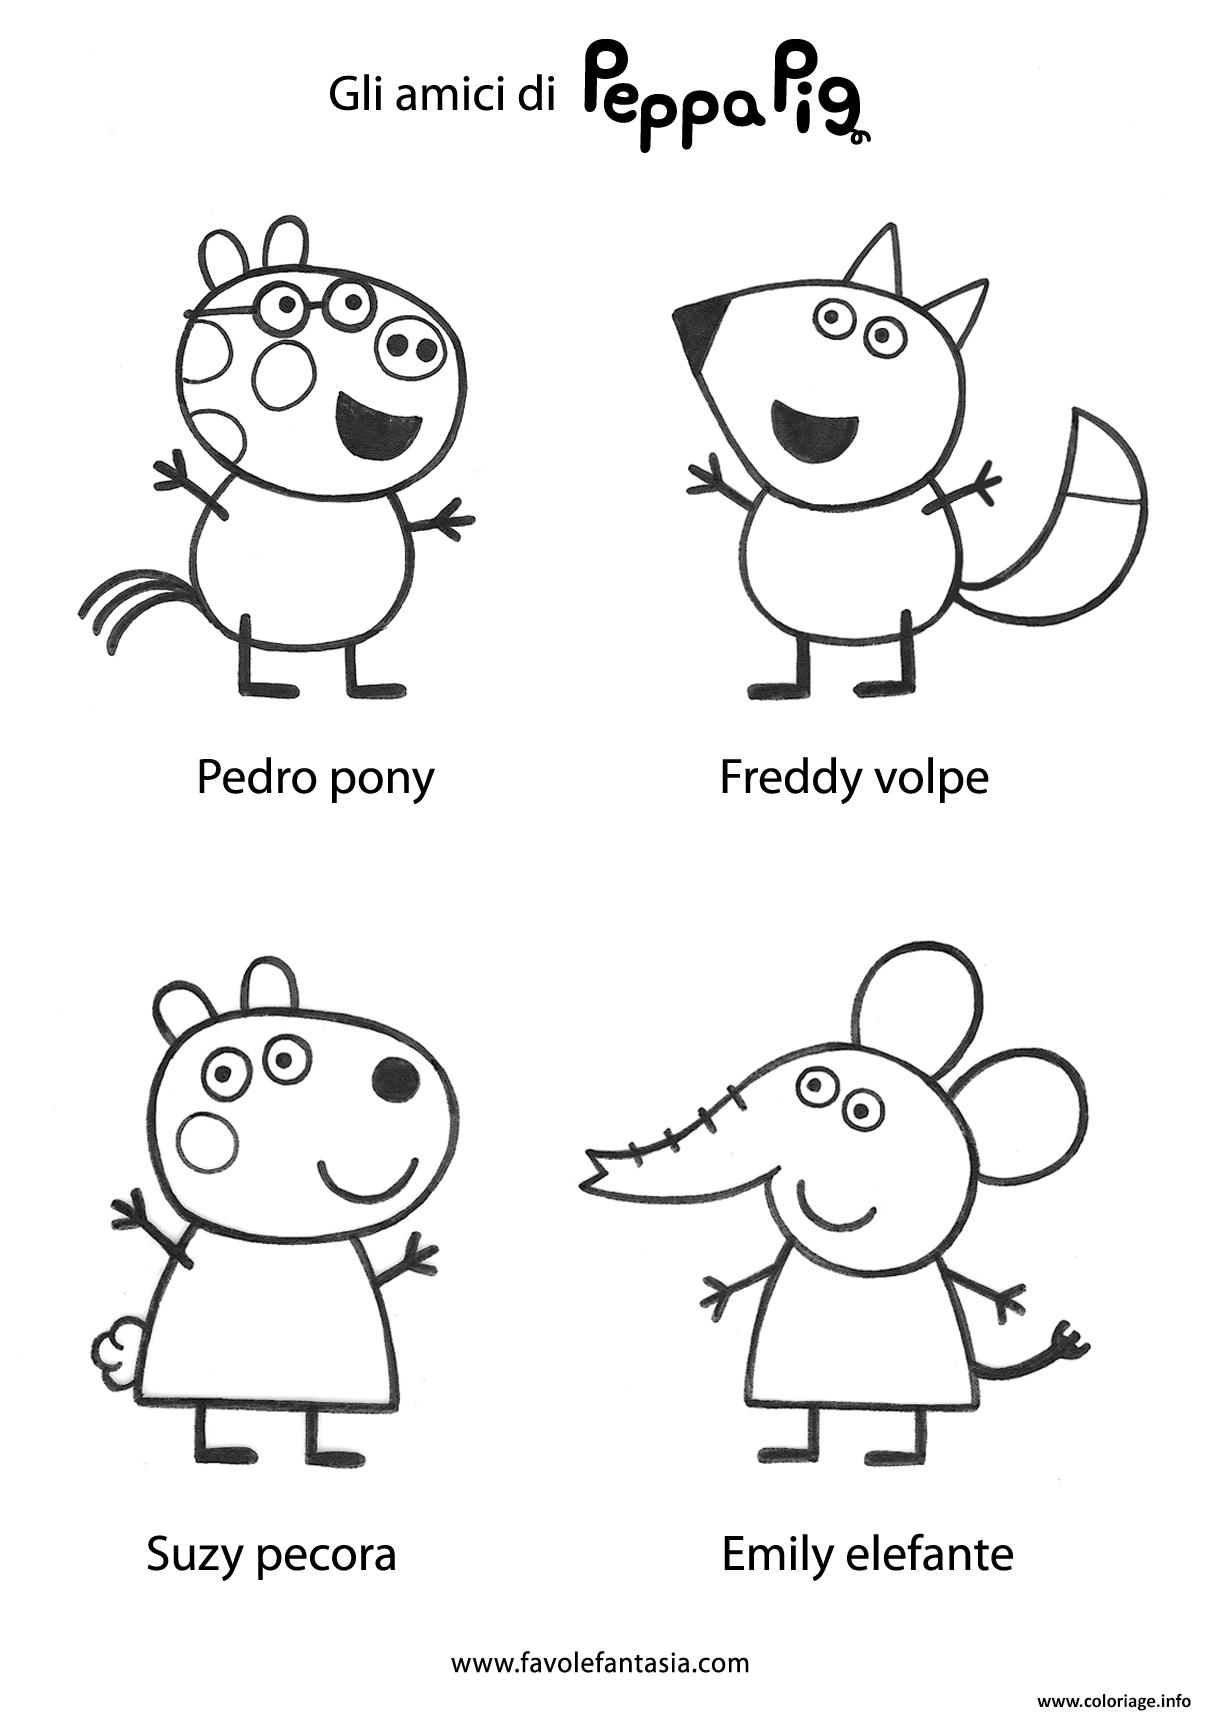 Coloriage Peppa Pig 78 dessin